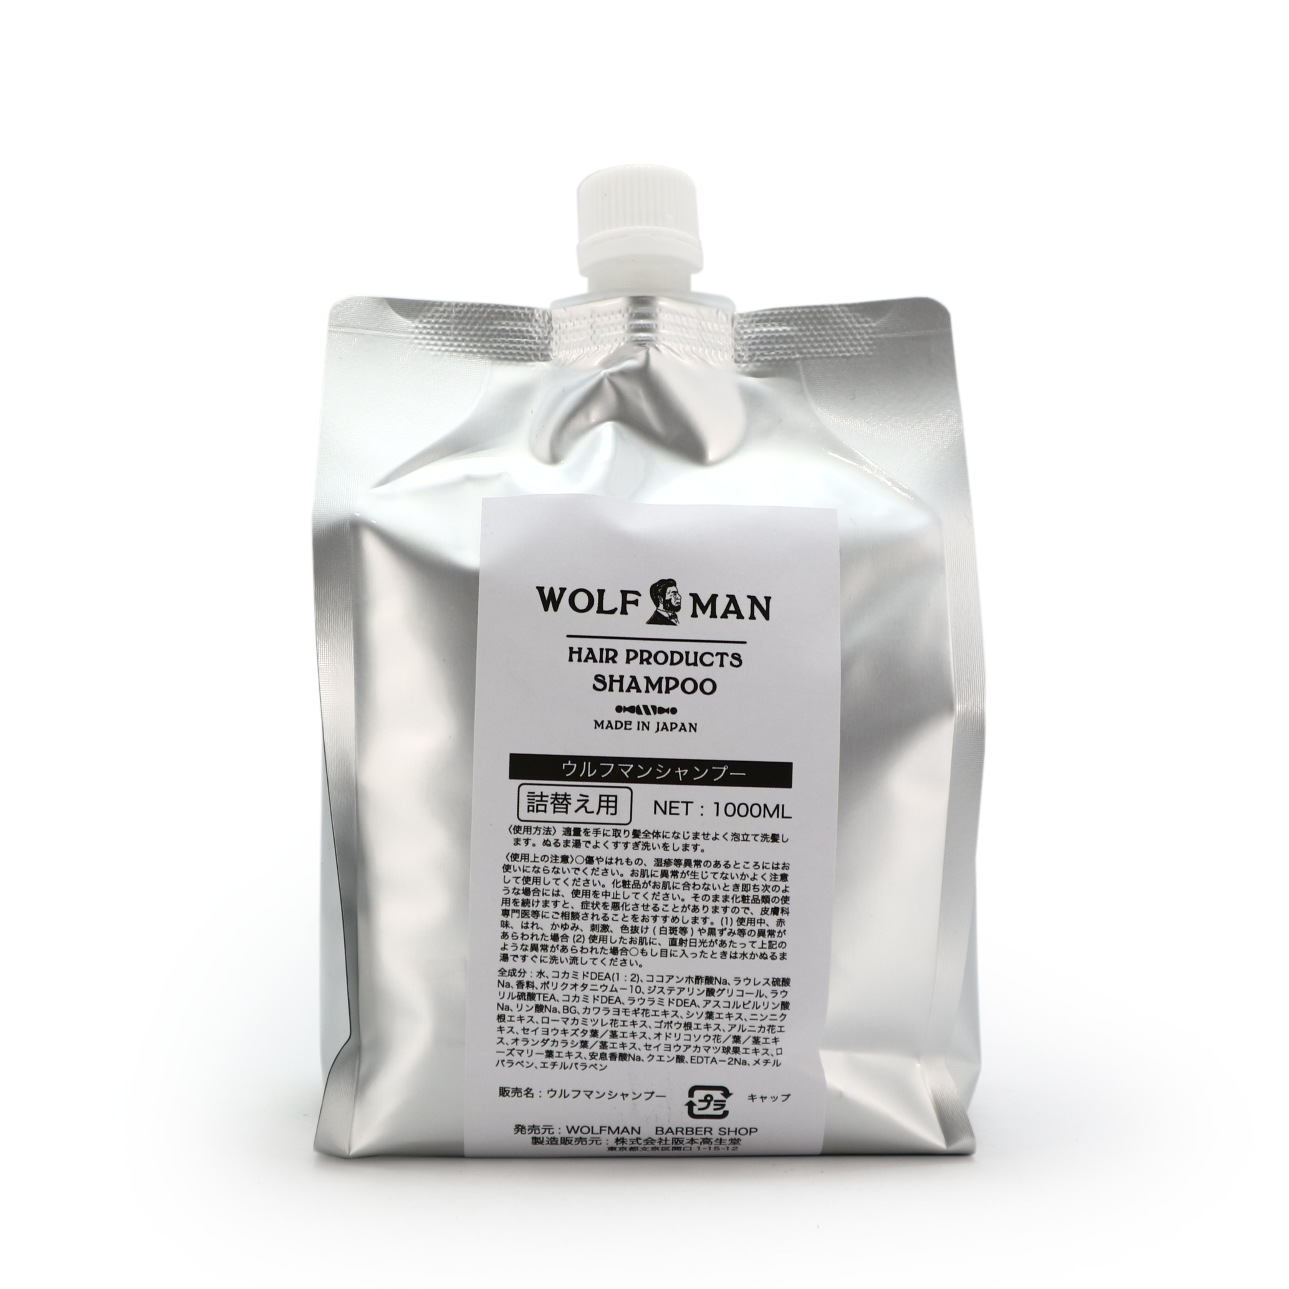 WOLFMAN SHAMPOO 詰替え用/WOLFMAN(シャンプー)